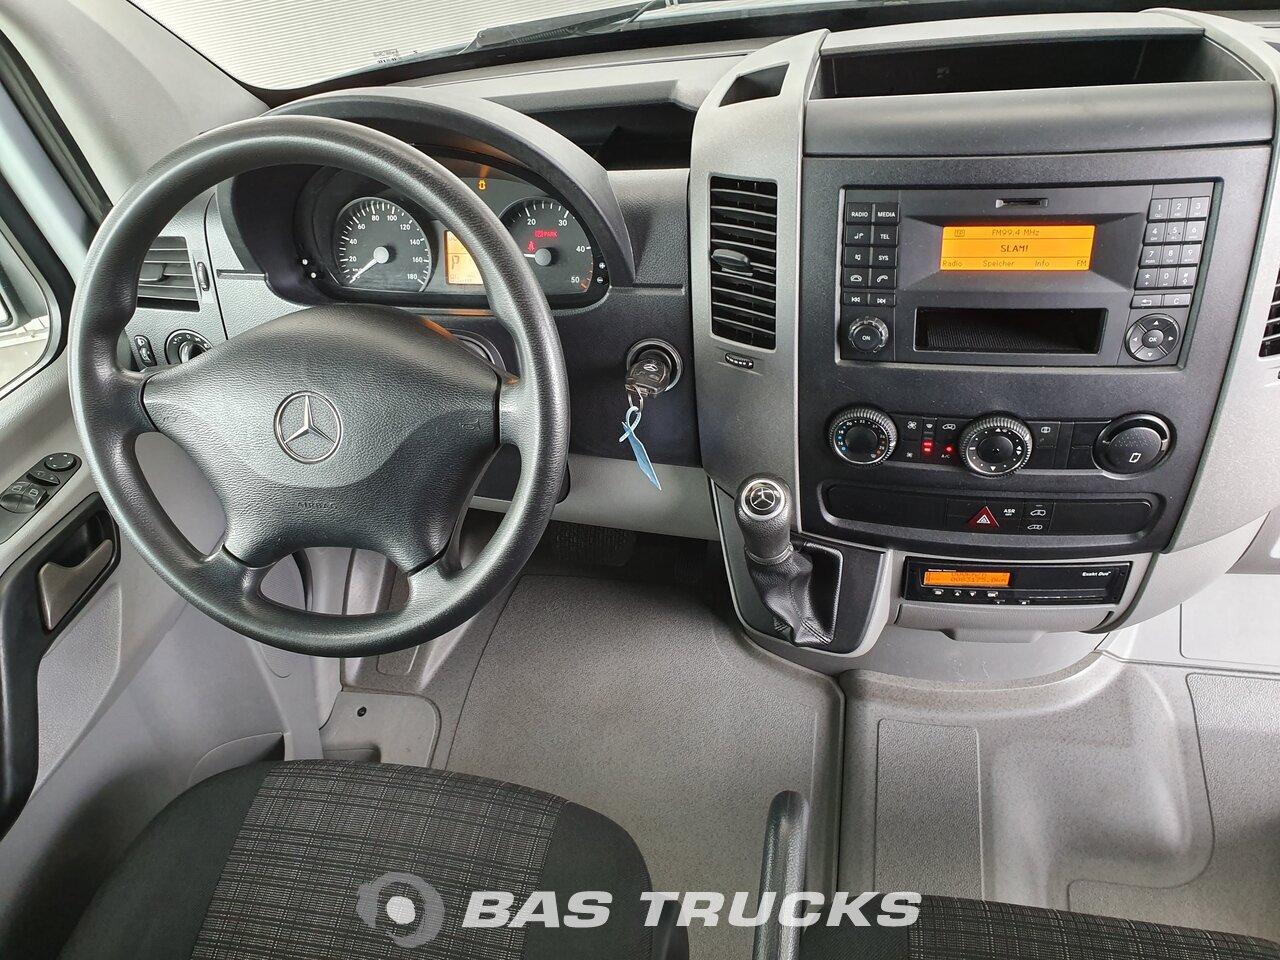 For sale at BAS Trucks: Mercedes Sprinter 4X2 02/2015